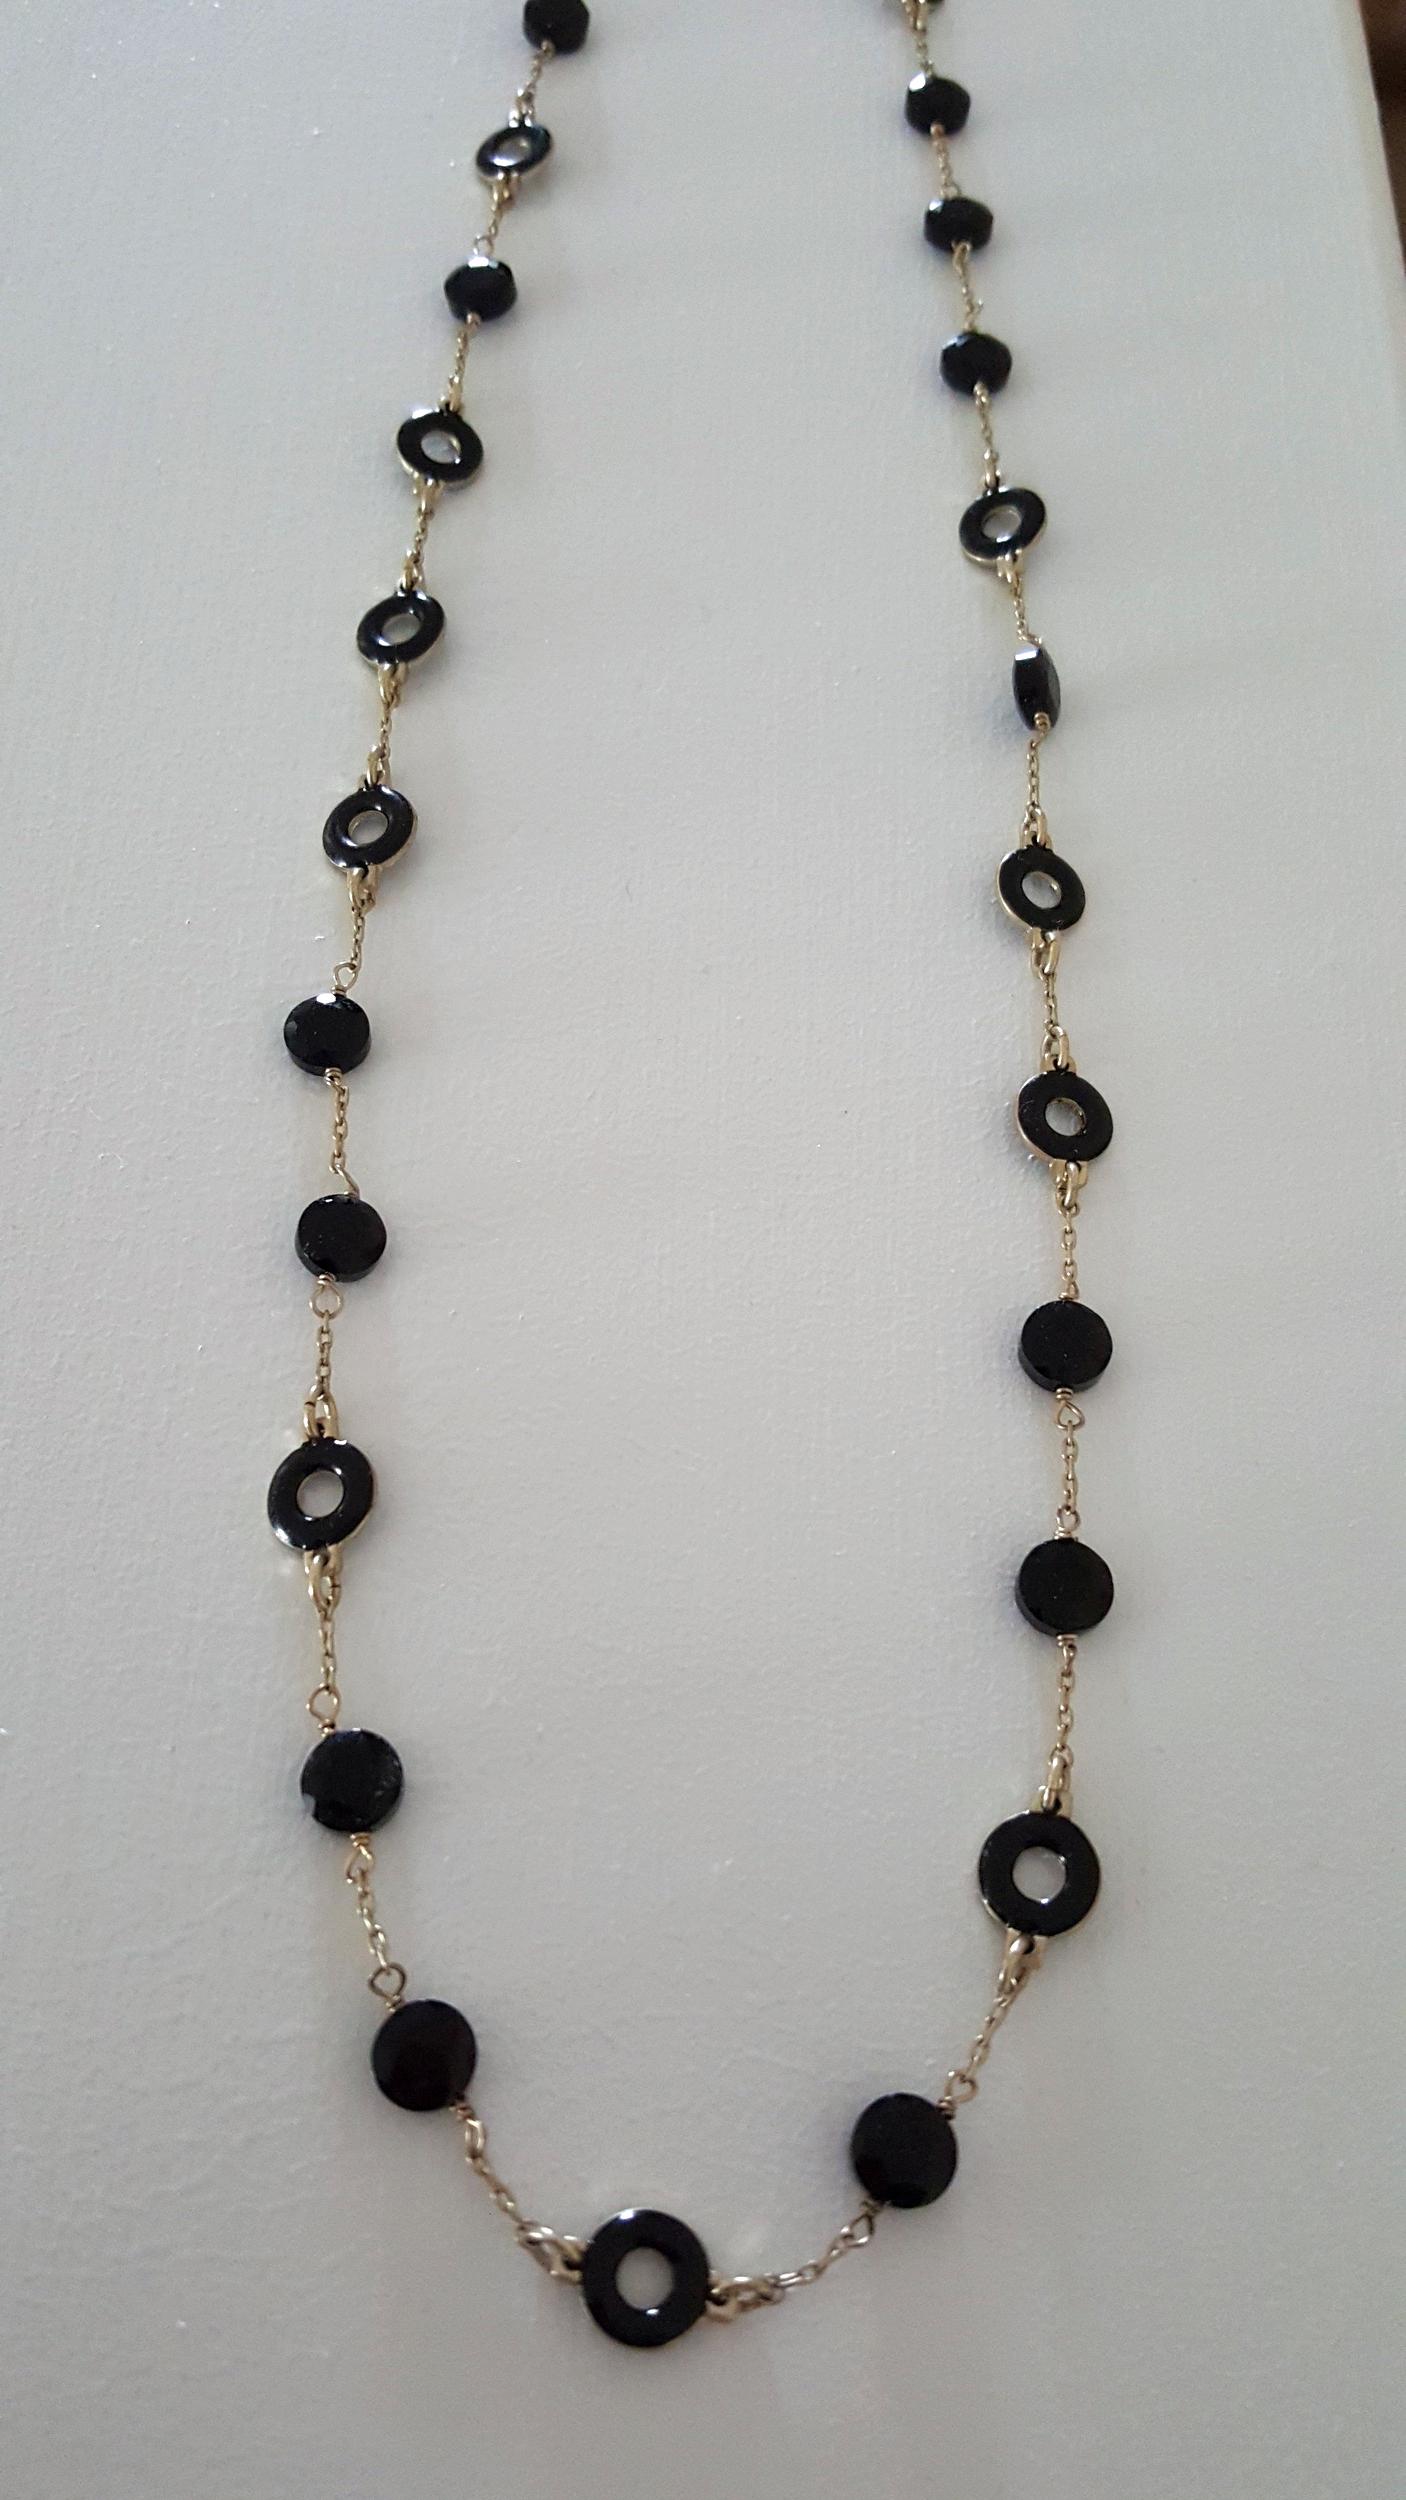 JCREW Black Necklace